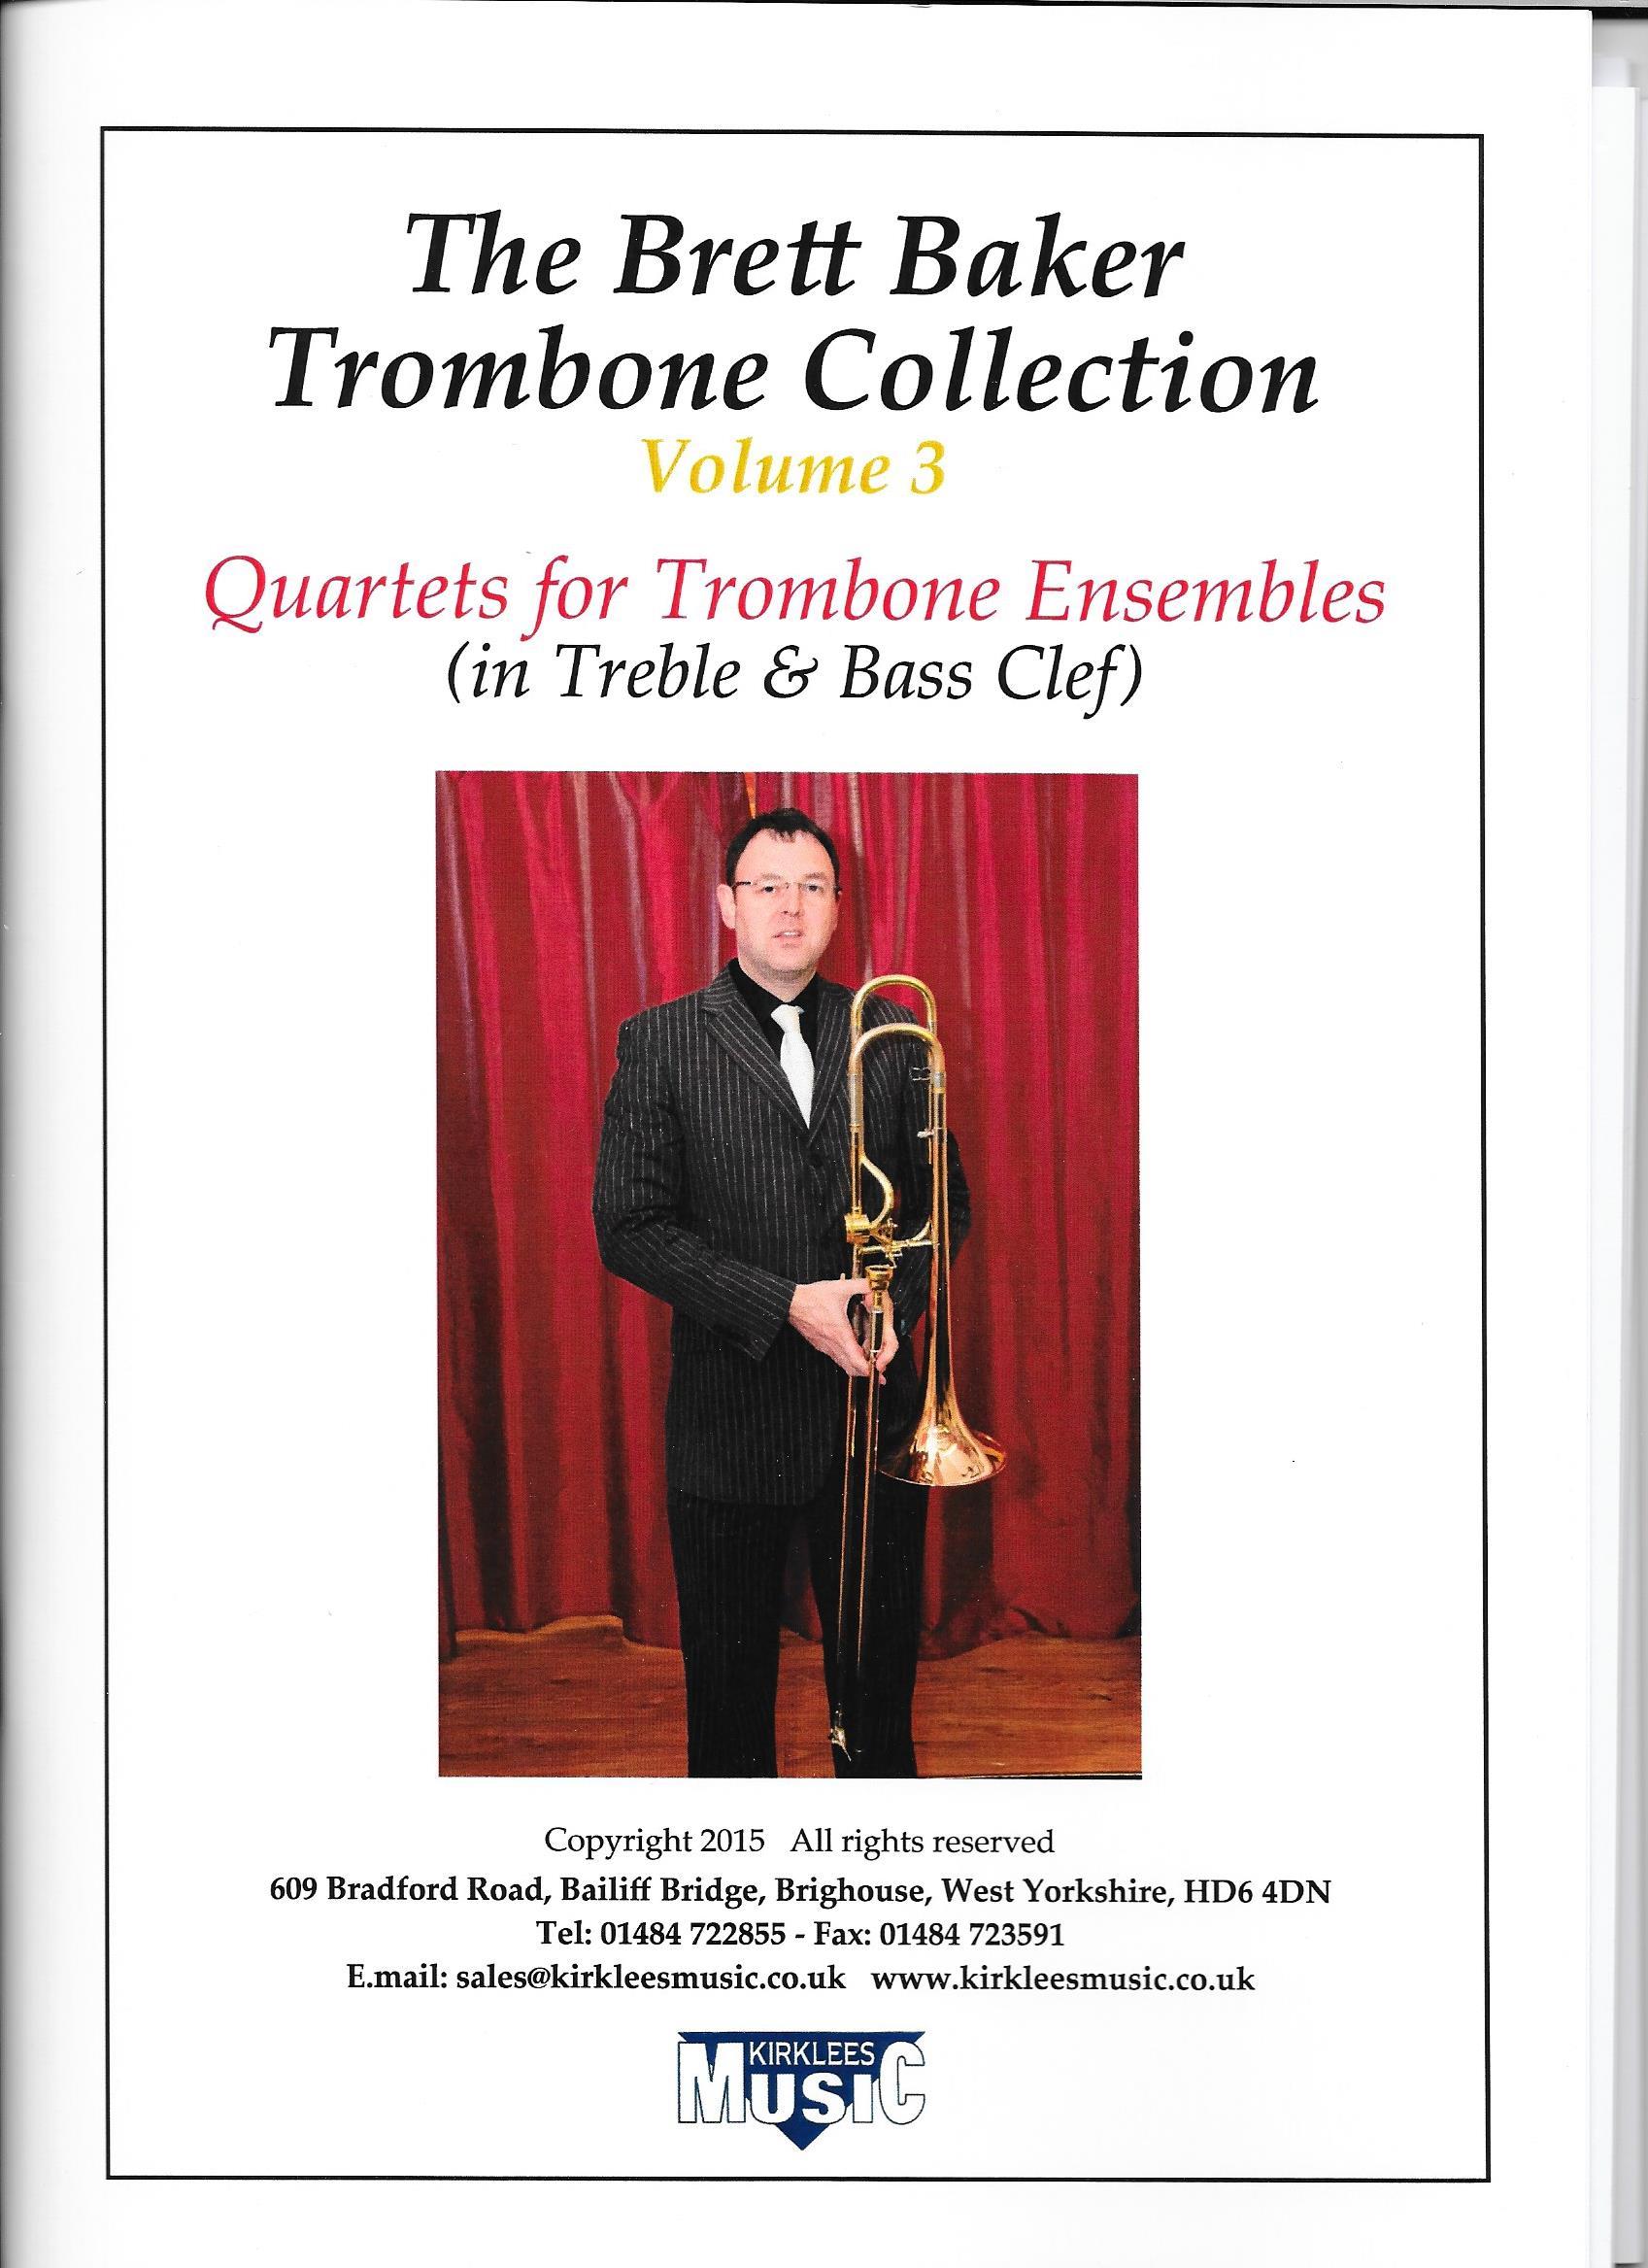 Sheet Music - The Brett Baker Trombone Collection Vol. 3 (Quartets)